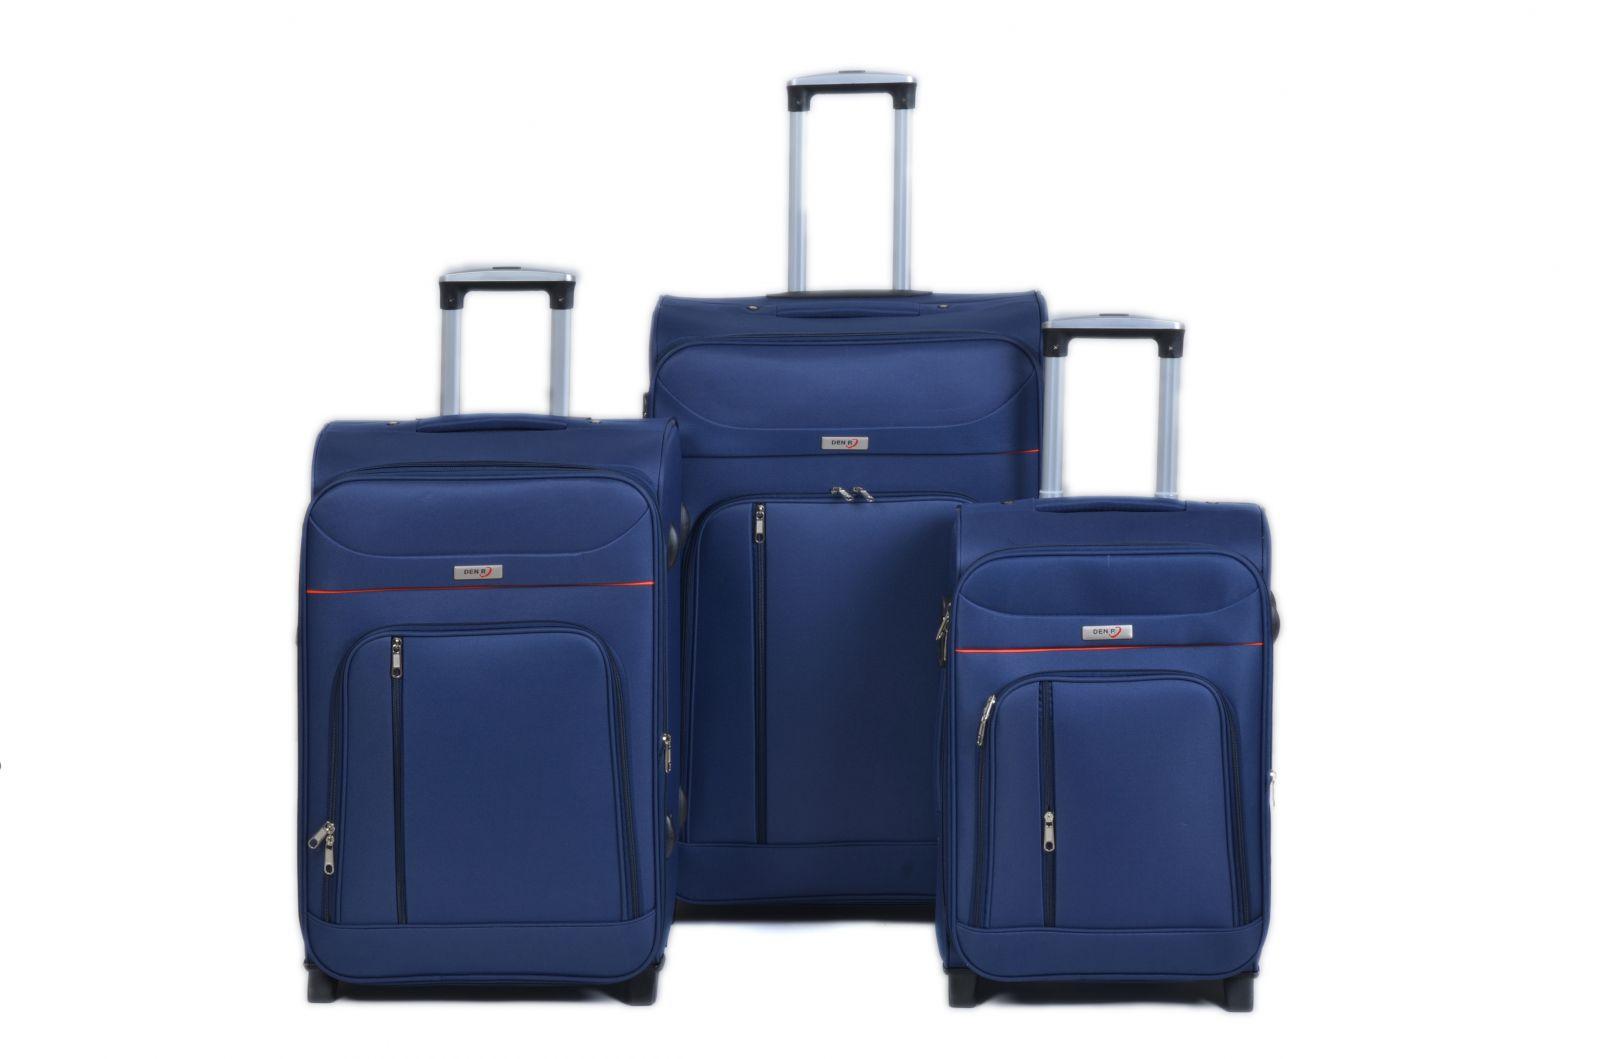 Trolley-CASE TC-B887 sada 3 kufru modrá E-batoh